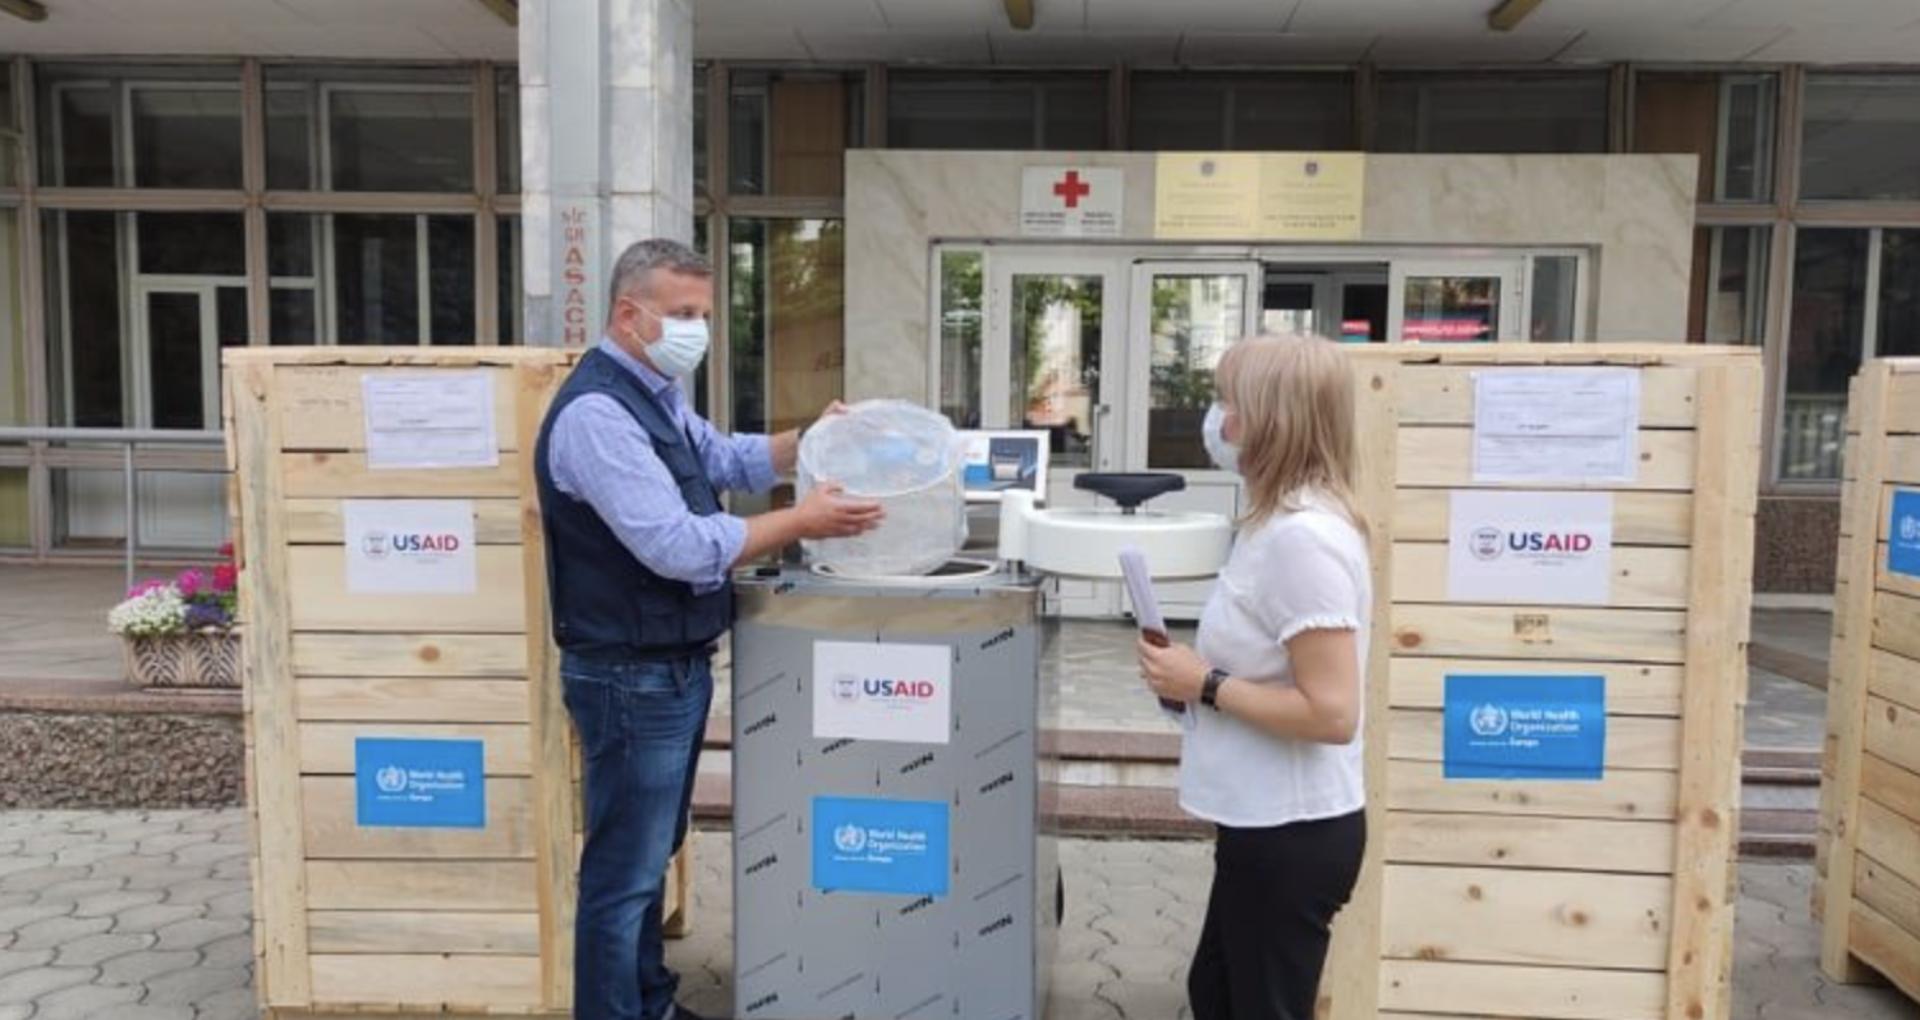 WHO and USAID Delivered Sterilization Equipment for Laboratories in Moldova